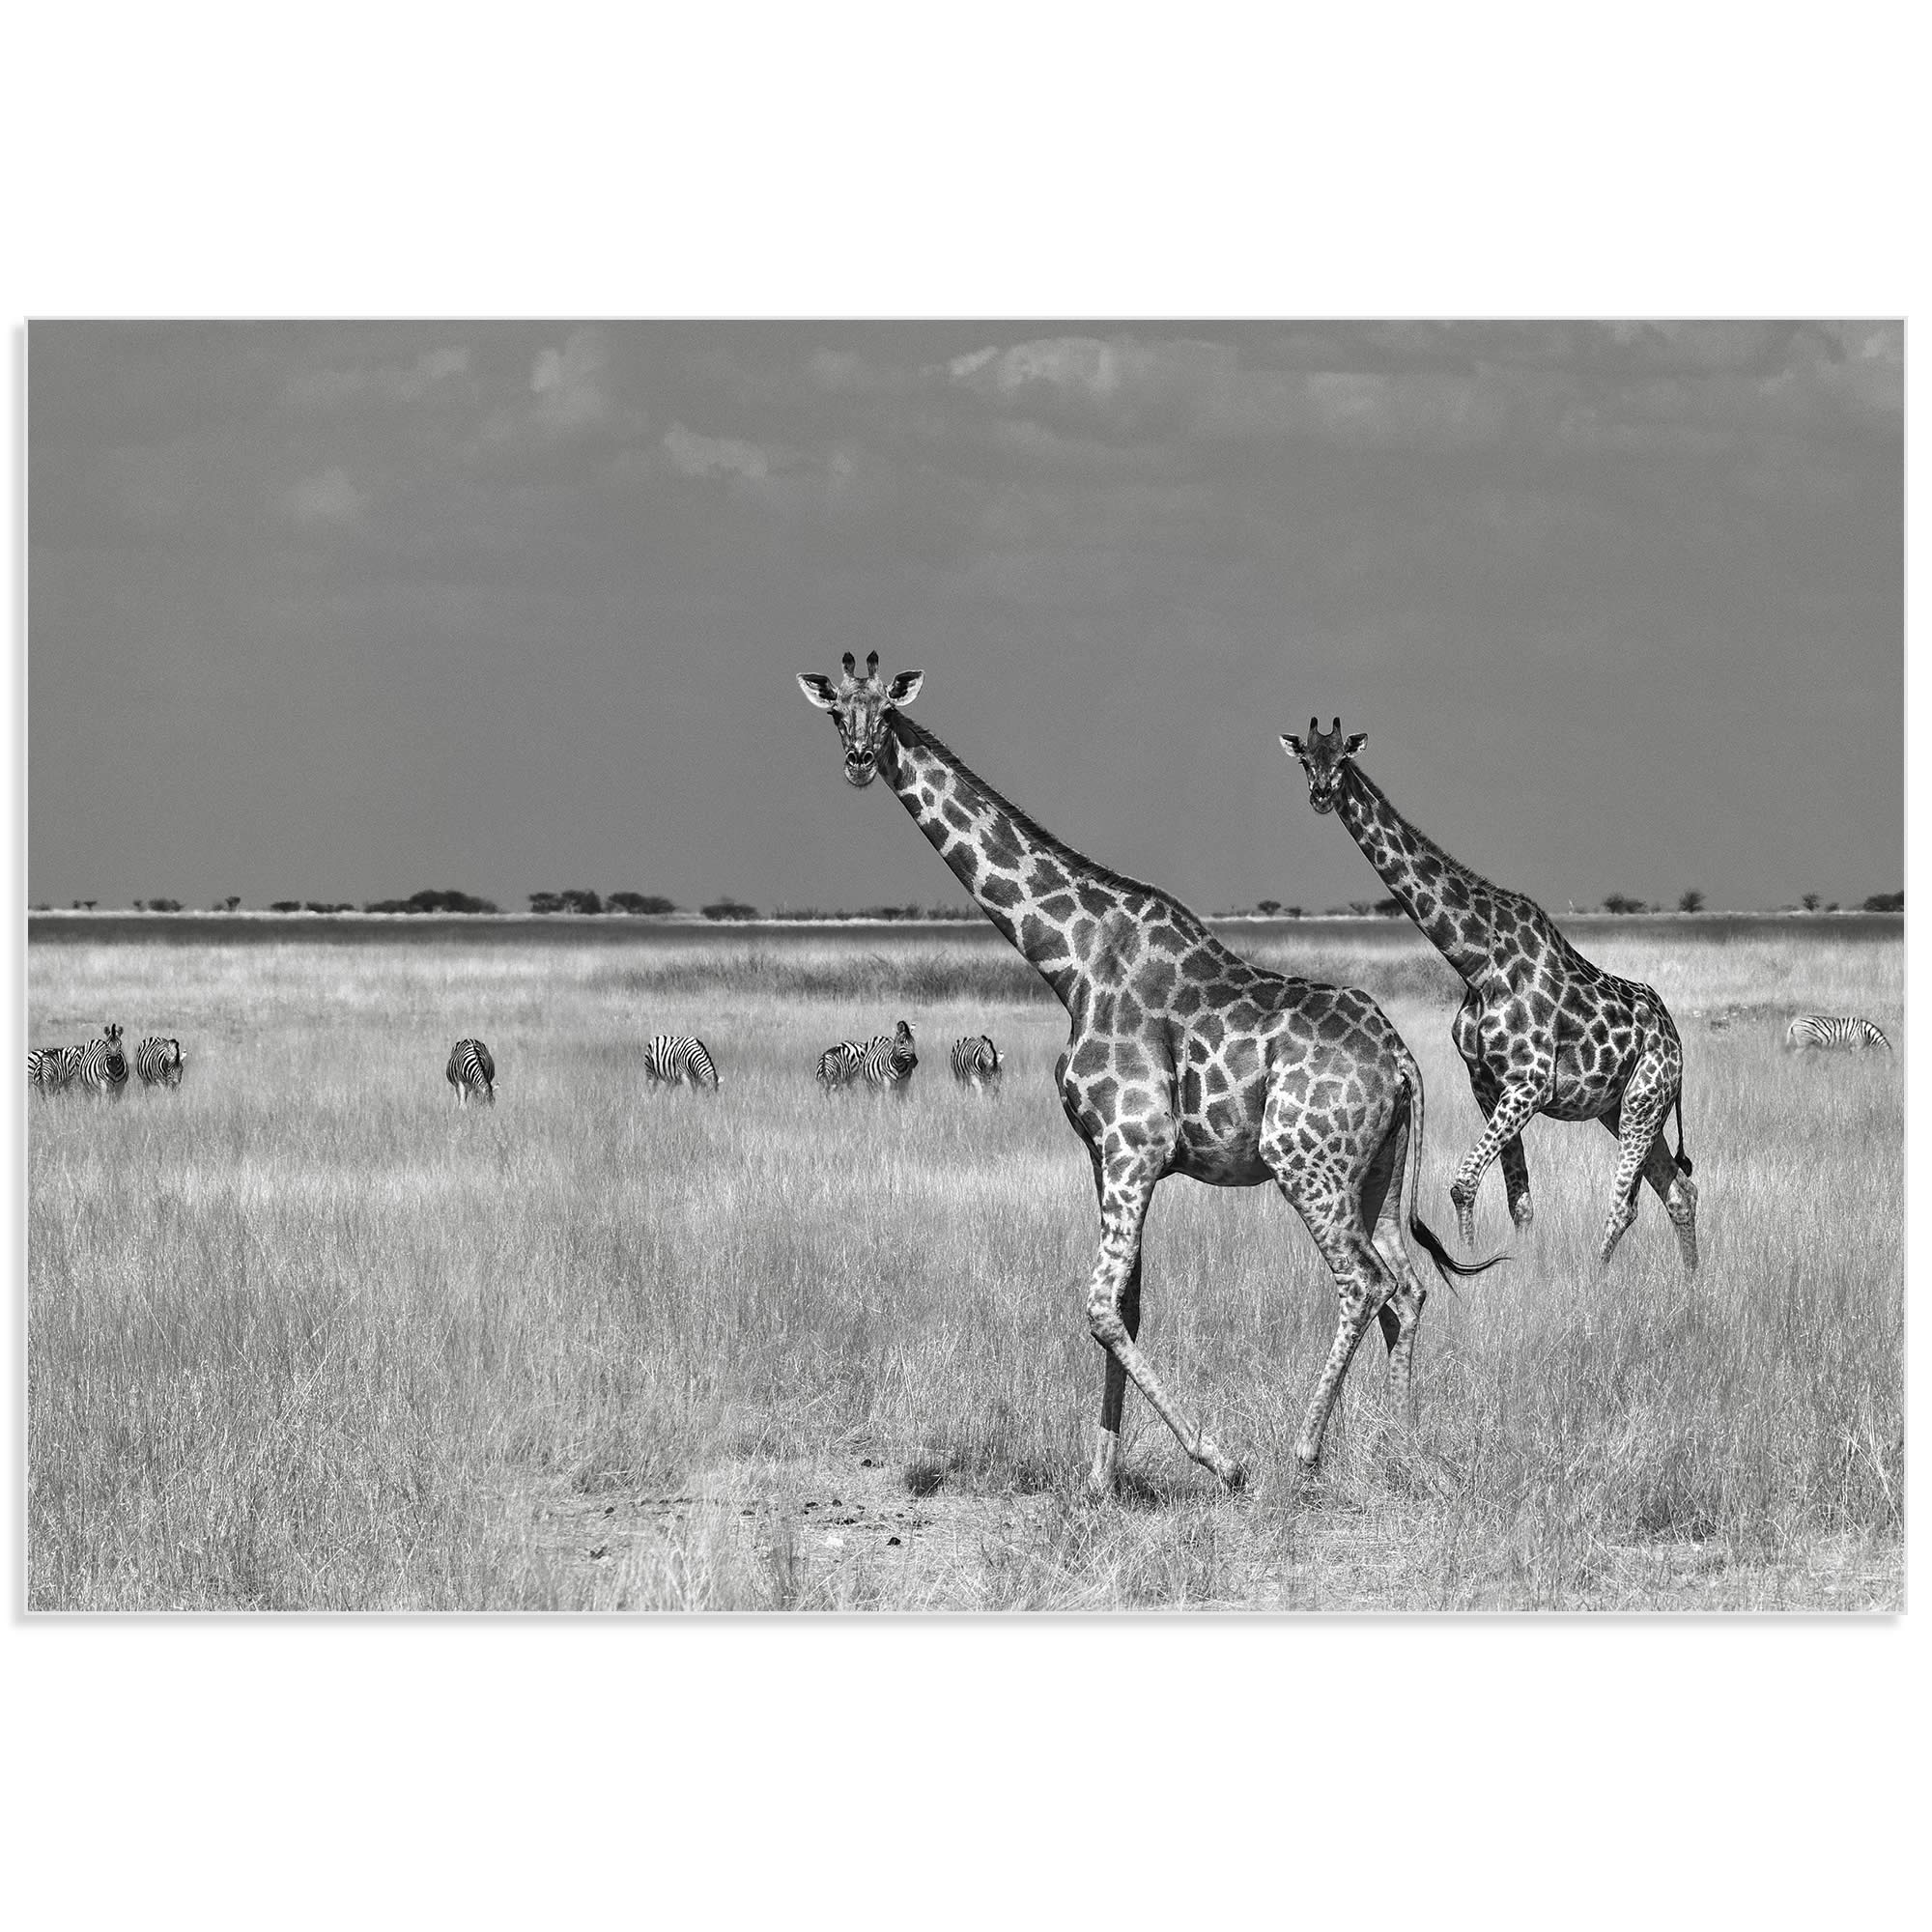 Savanna Favorites by Mathilde Guillemot - Giraffe and Zebra Art on Metal or Acrylic - Alternate View 2